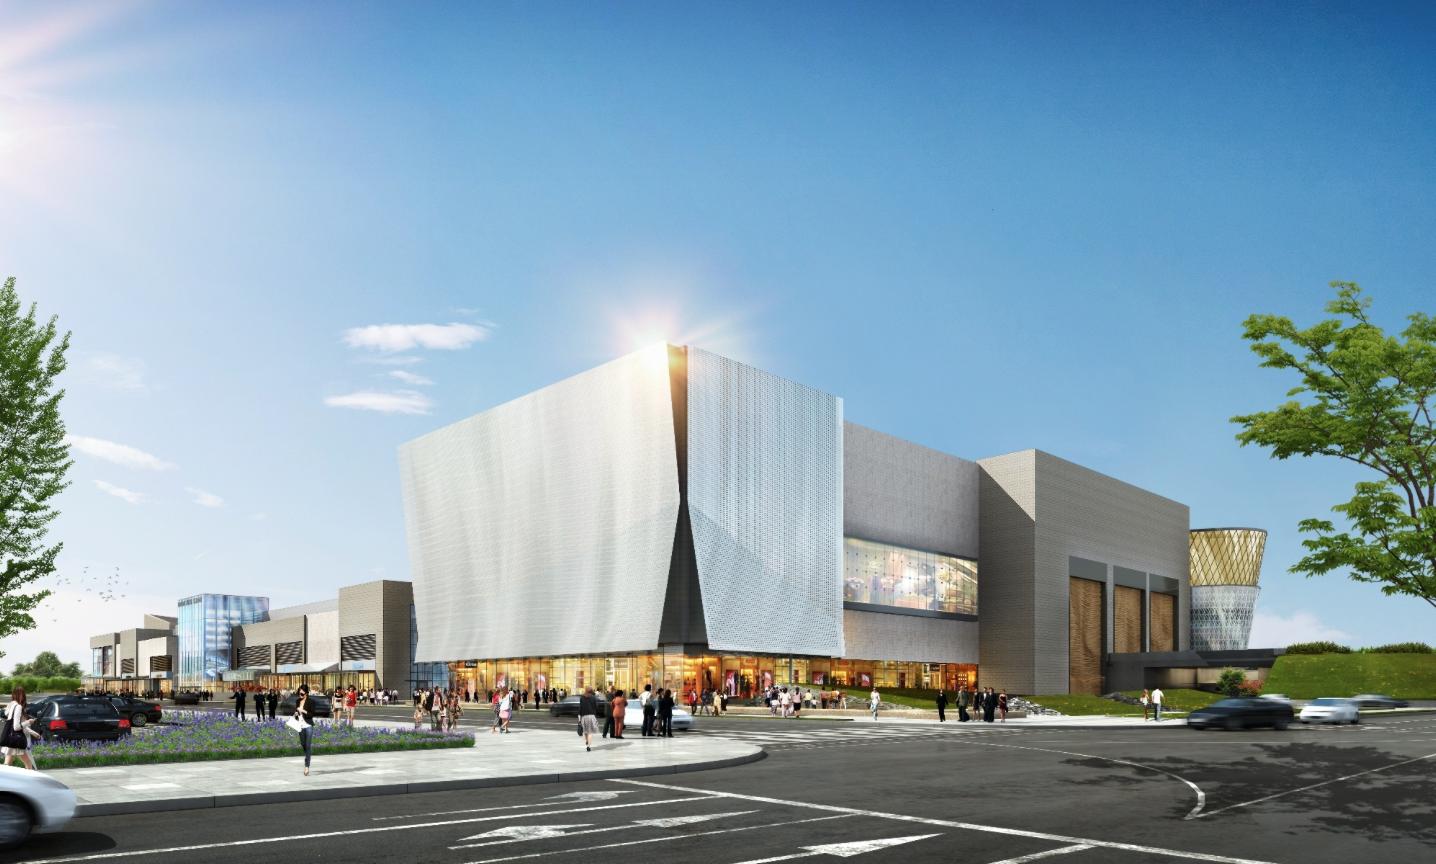 Shinsegae to open all-in-one shopping complex | http://goo.gl/GX2JND